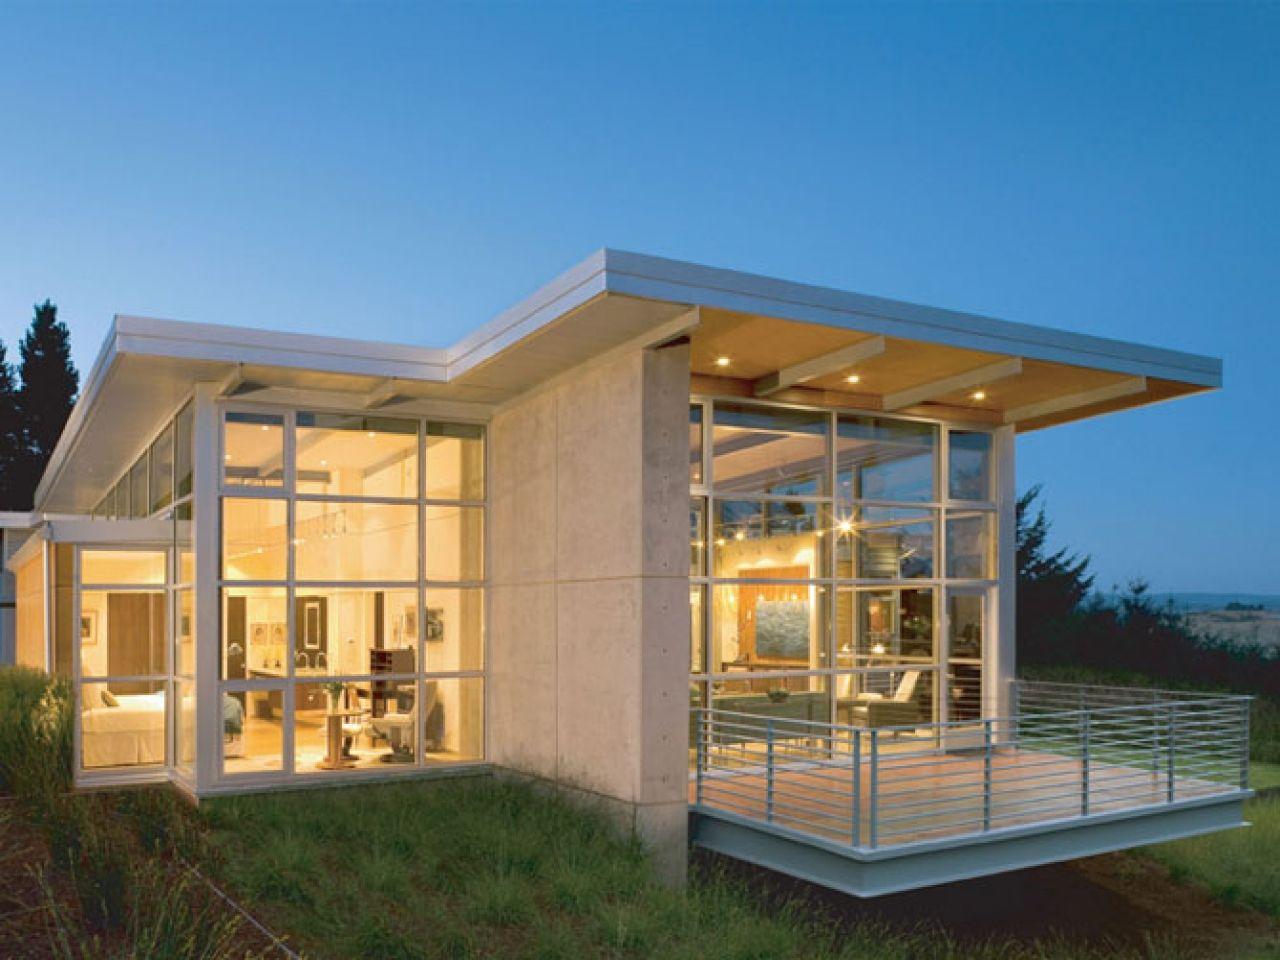 Beautiful Small Modern House Plans Under 1000 Sq Ft Modern Farmhouse Plans House Designs Exterior Modern House Plans